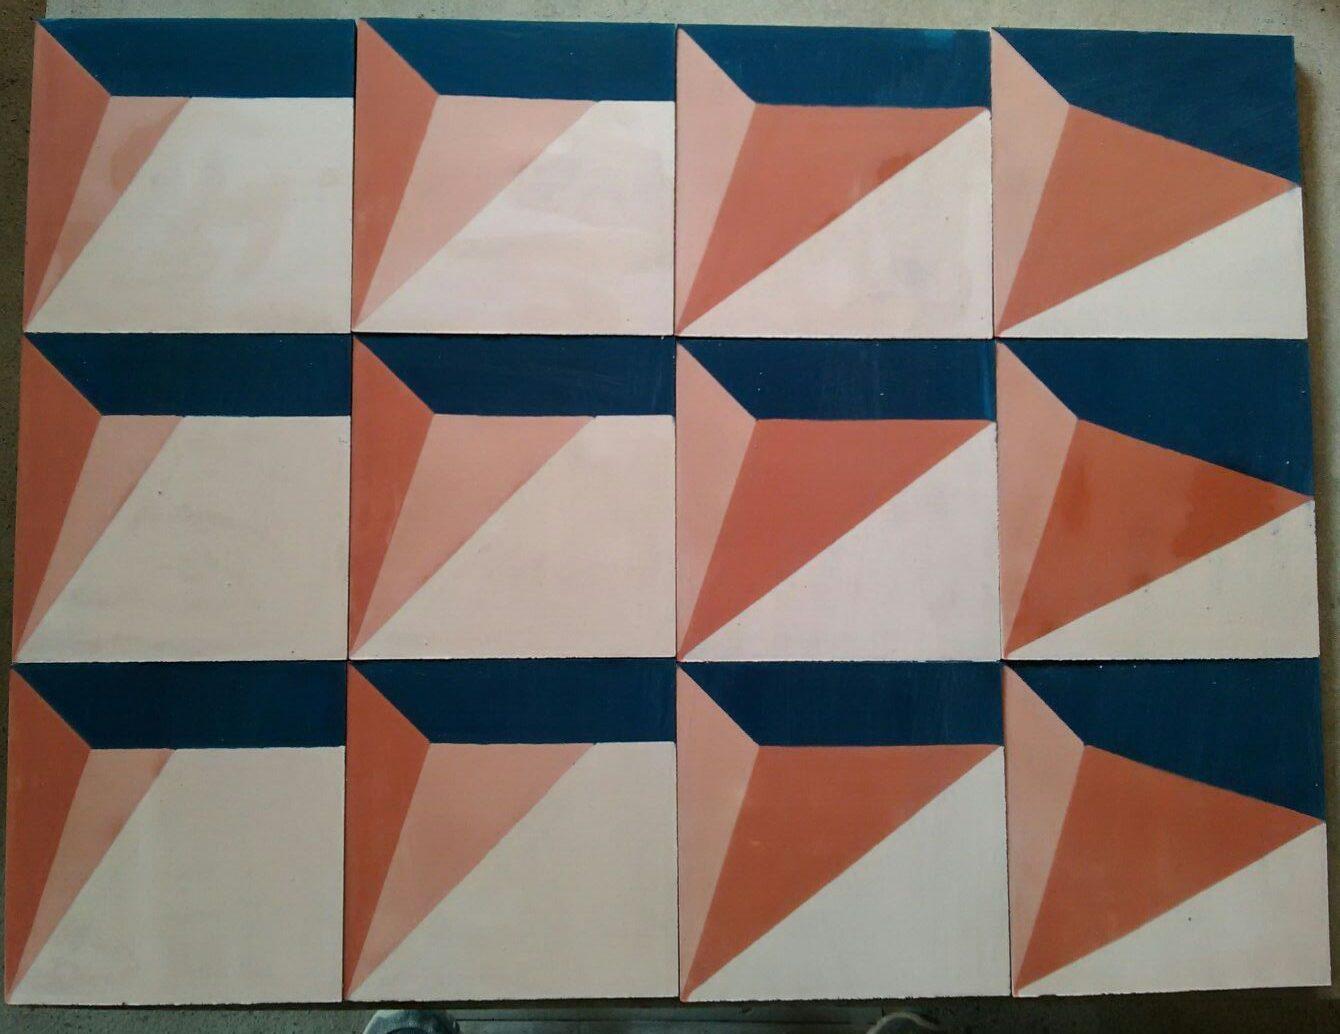 Taller-construccion-paviment-hiruki-7-mosaicsmarti